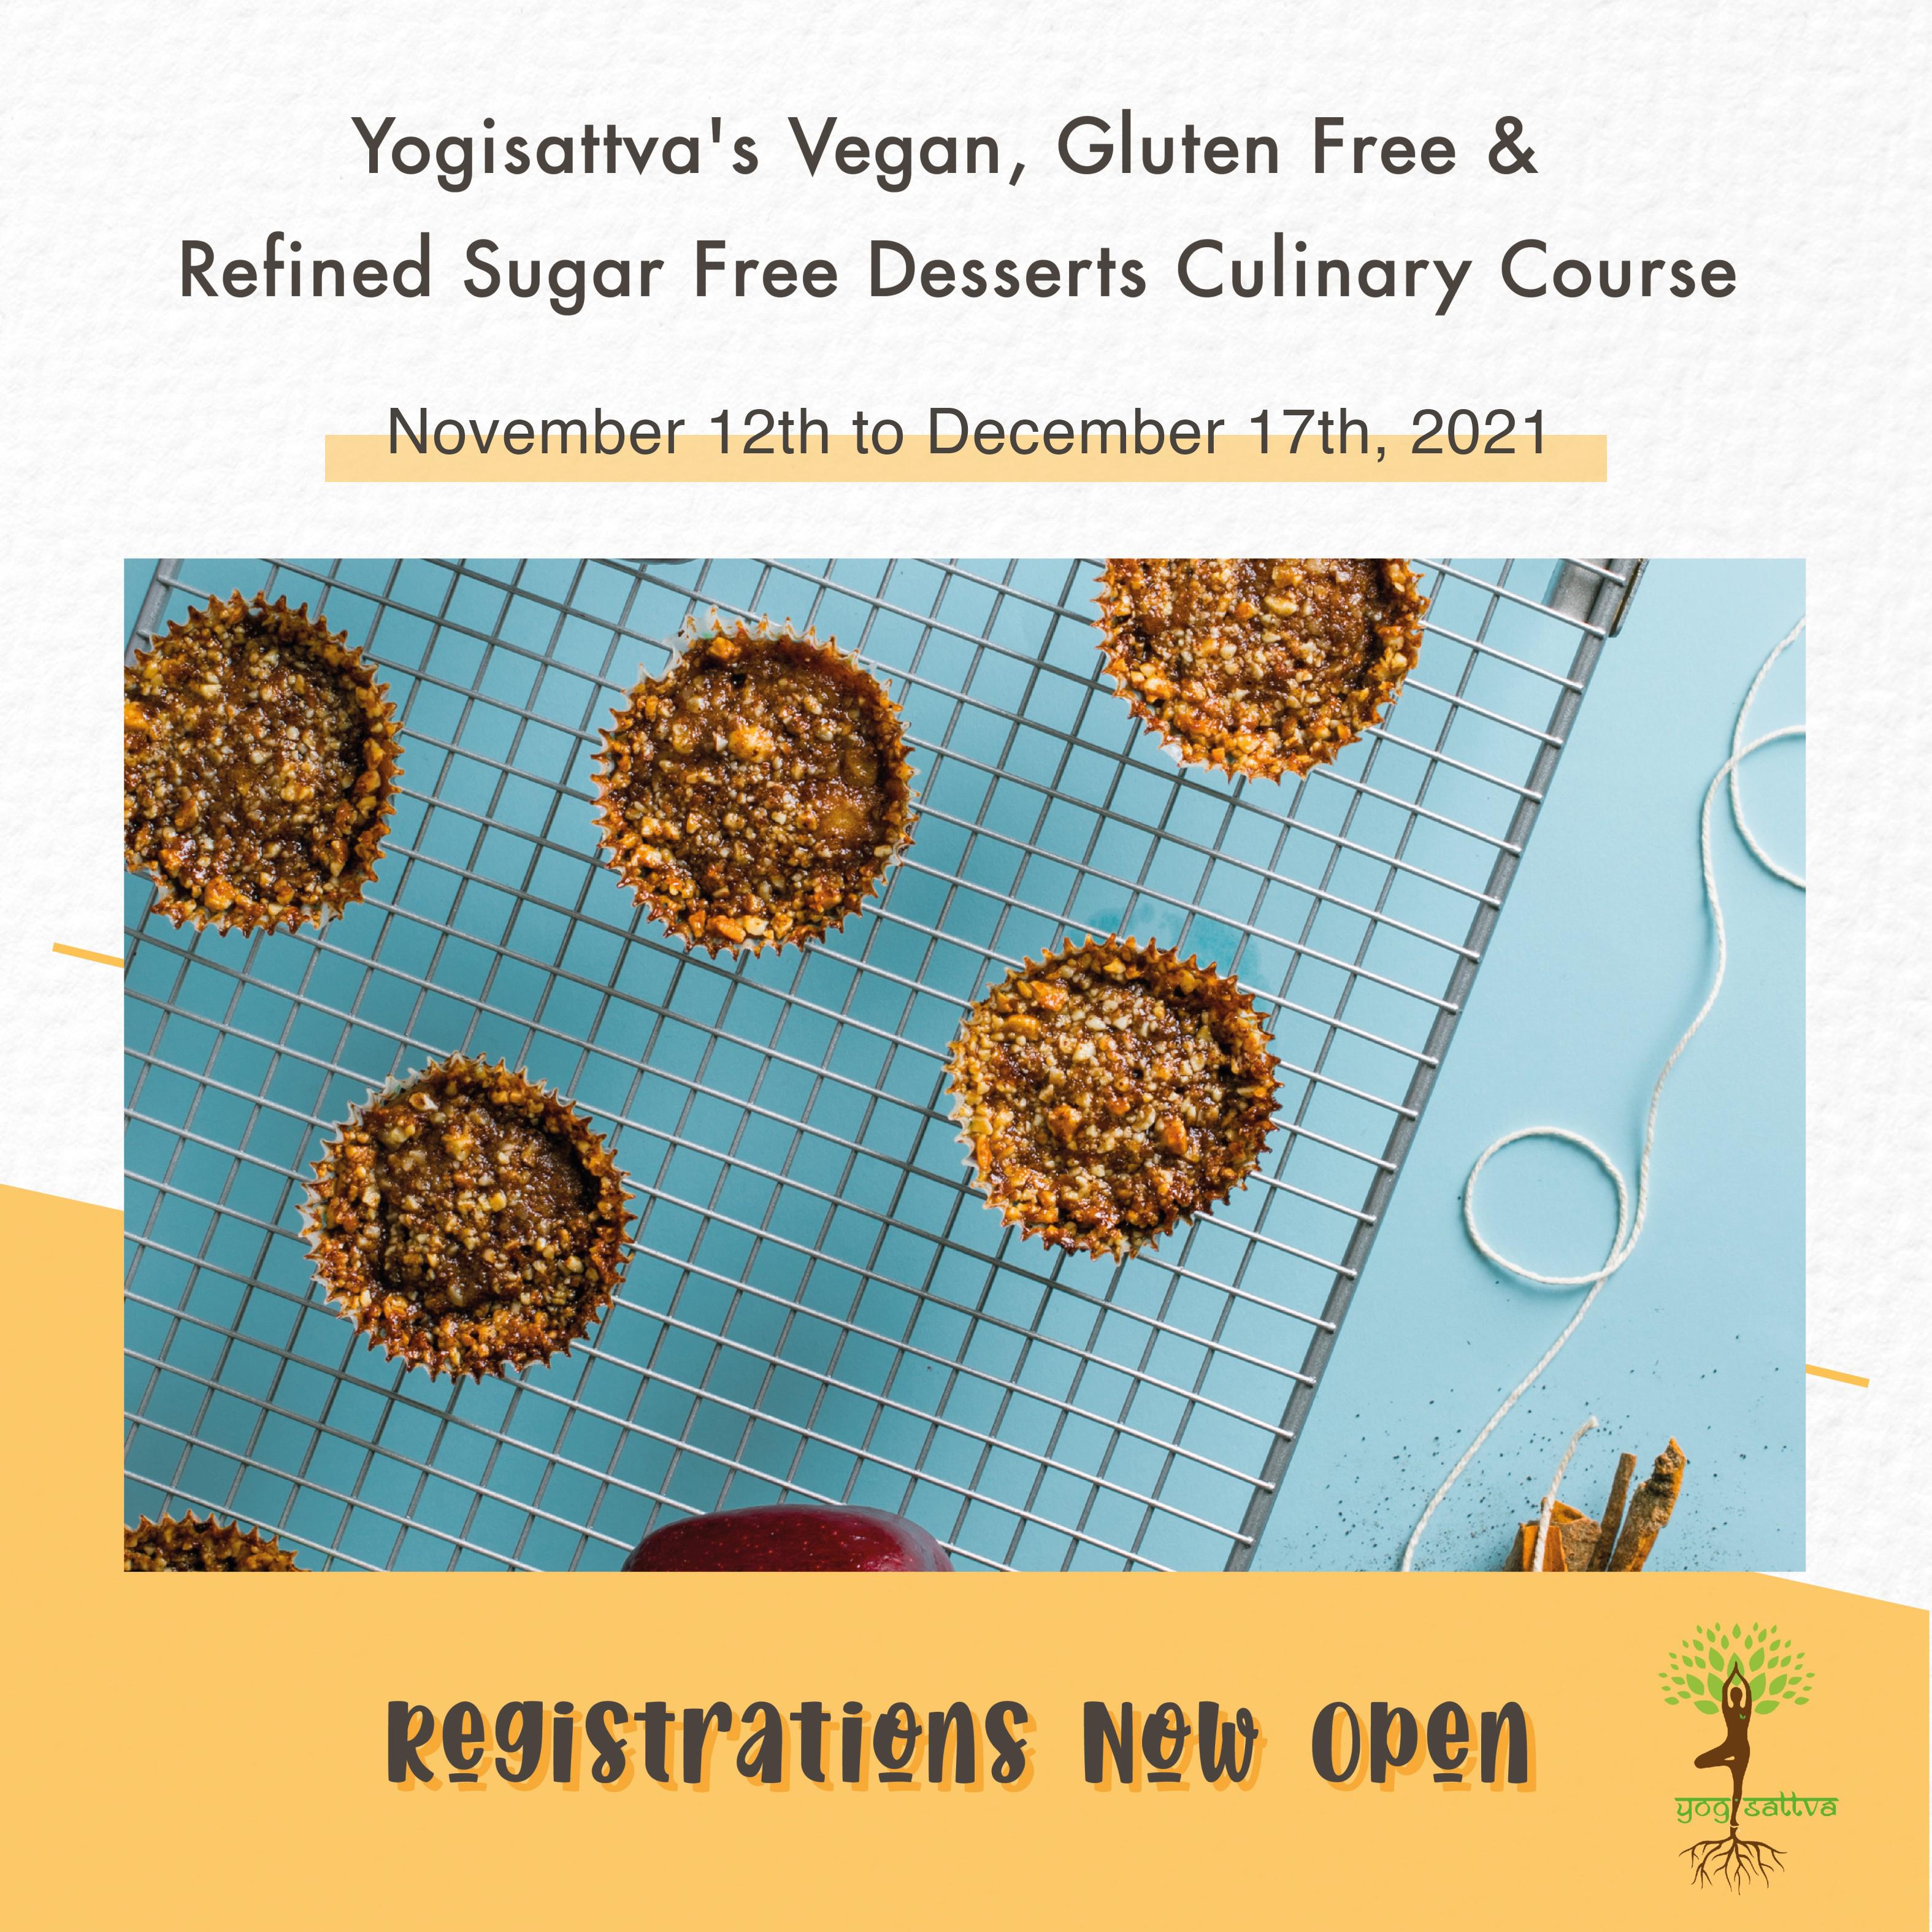 Yogisattva's Vegan, Gluten Free & Refined Sugar Free Desserts Culinary Course (5 week Access)